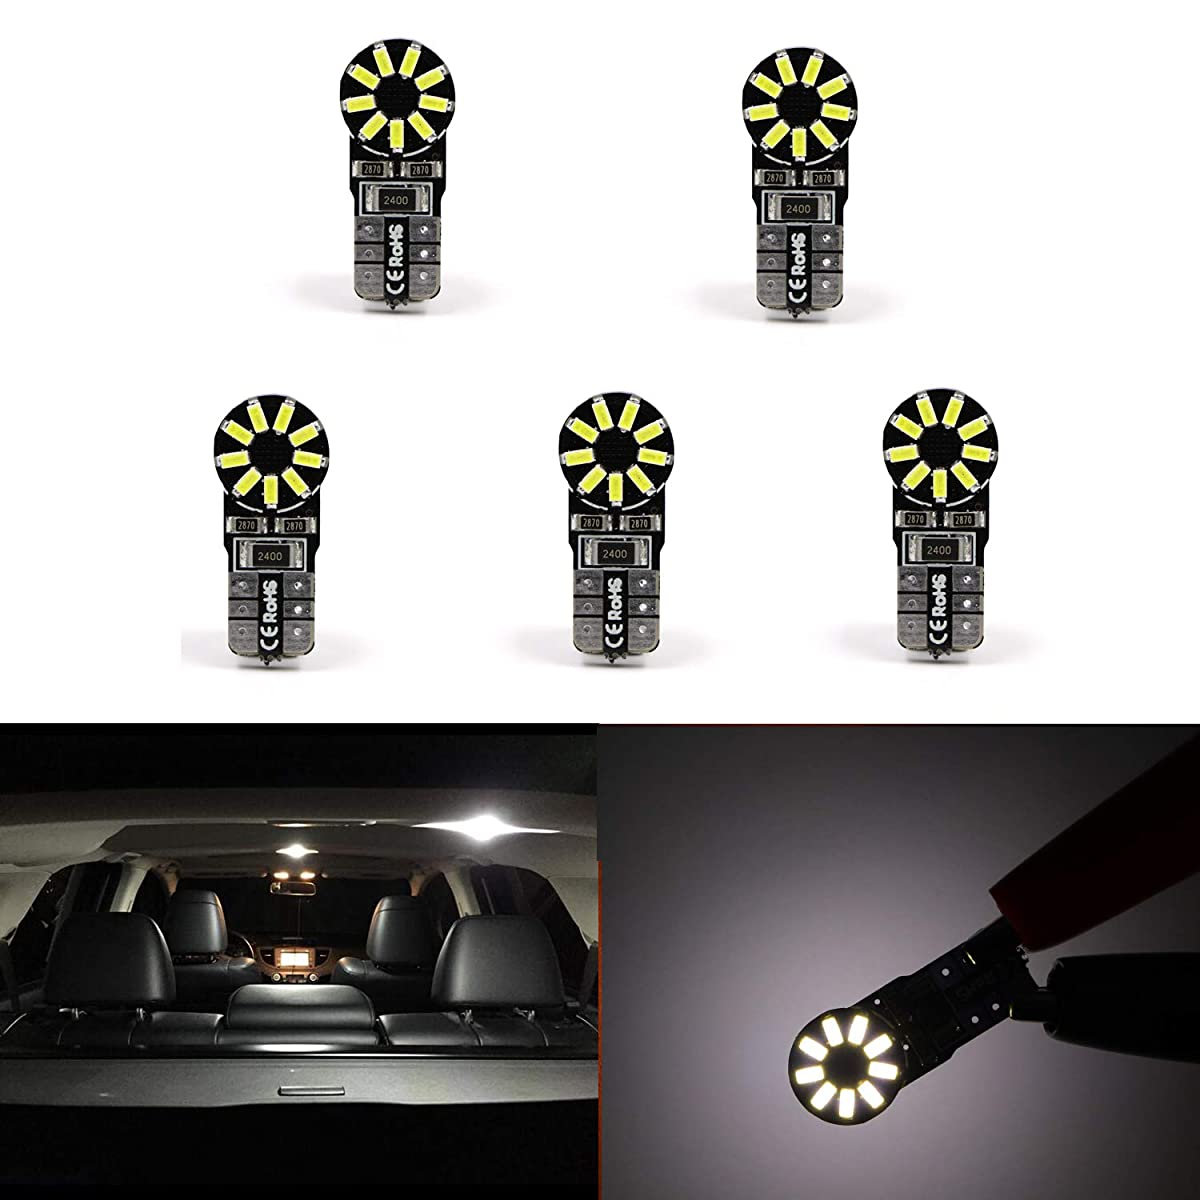 5PCS 168 2825 W5W T10 194 Dome Light CANBUS LED Bulb 6000K White High Power 3014 18SMD Super Bright